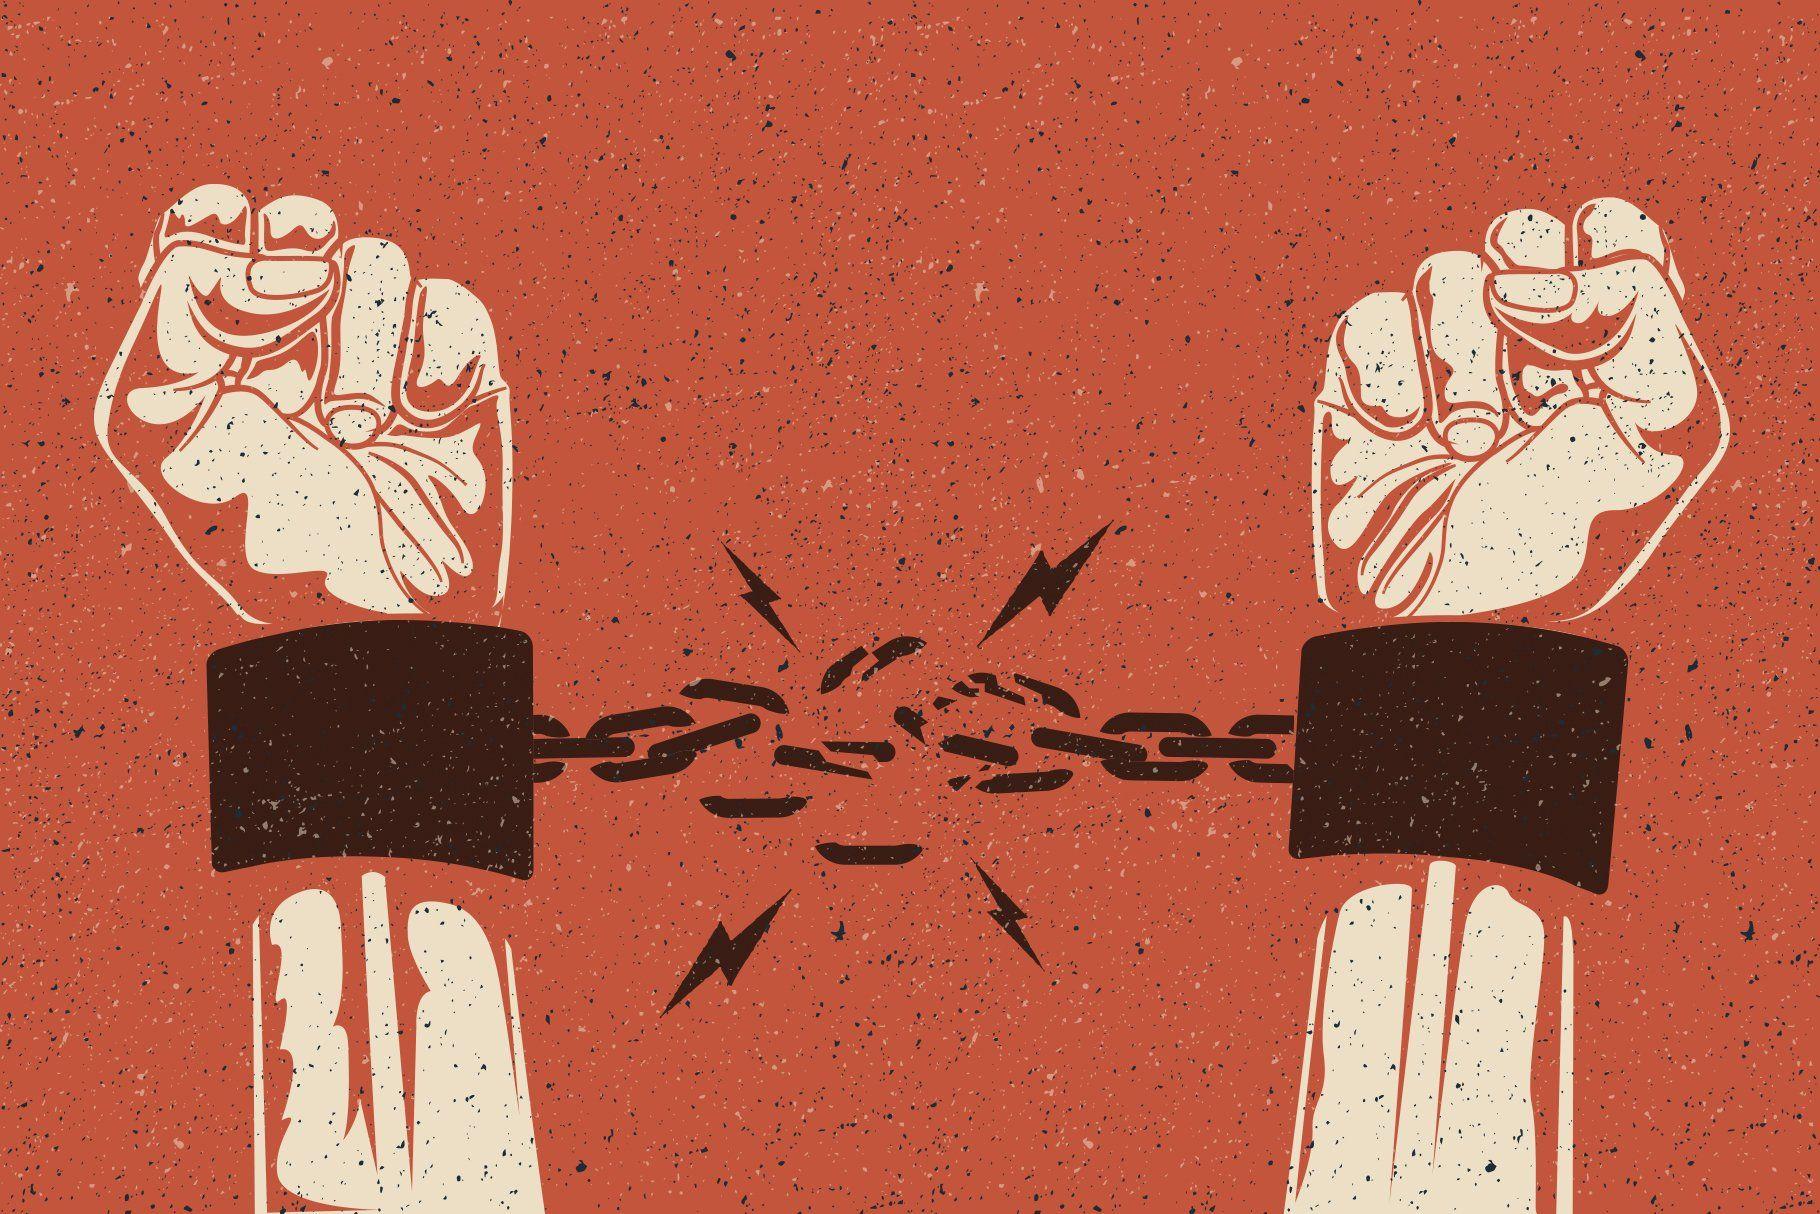 Human Hands Break The Chain Protest Art Broken Chain Illustration